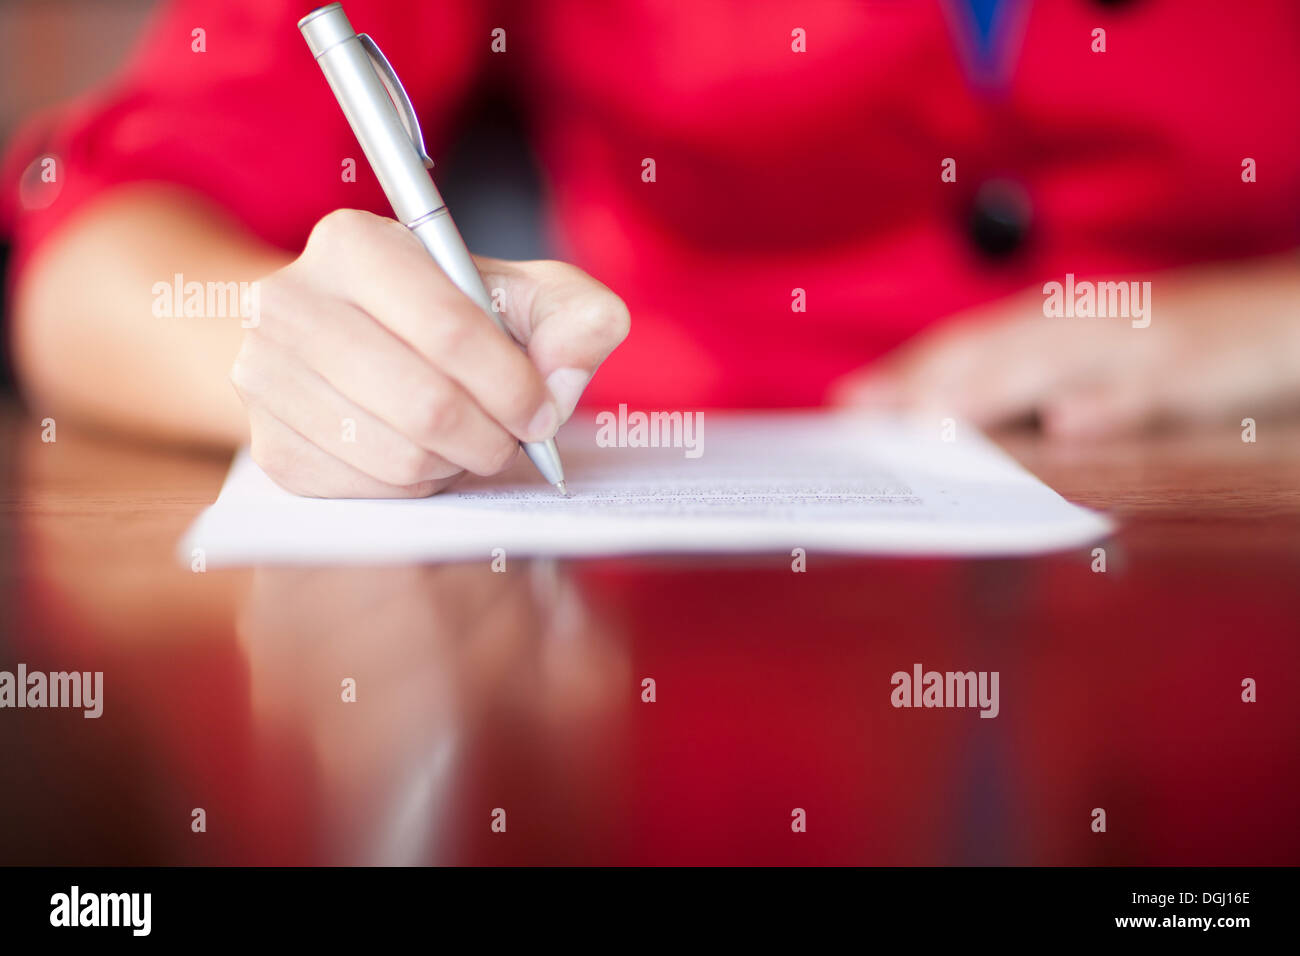 Woman writing, close up - Stock Image